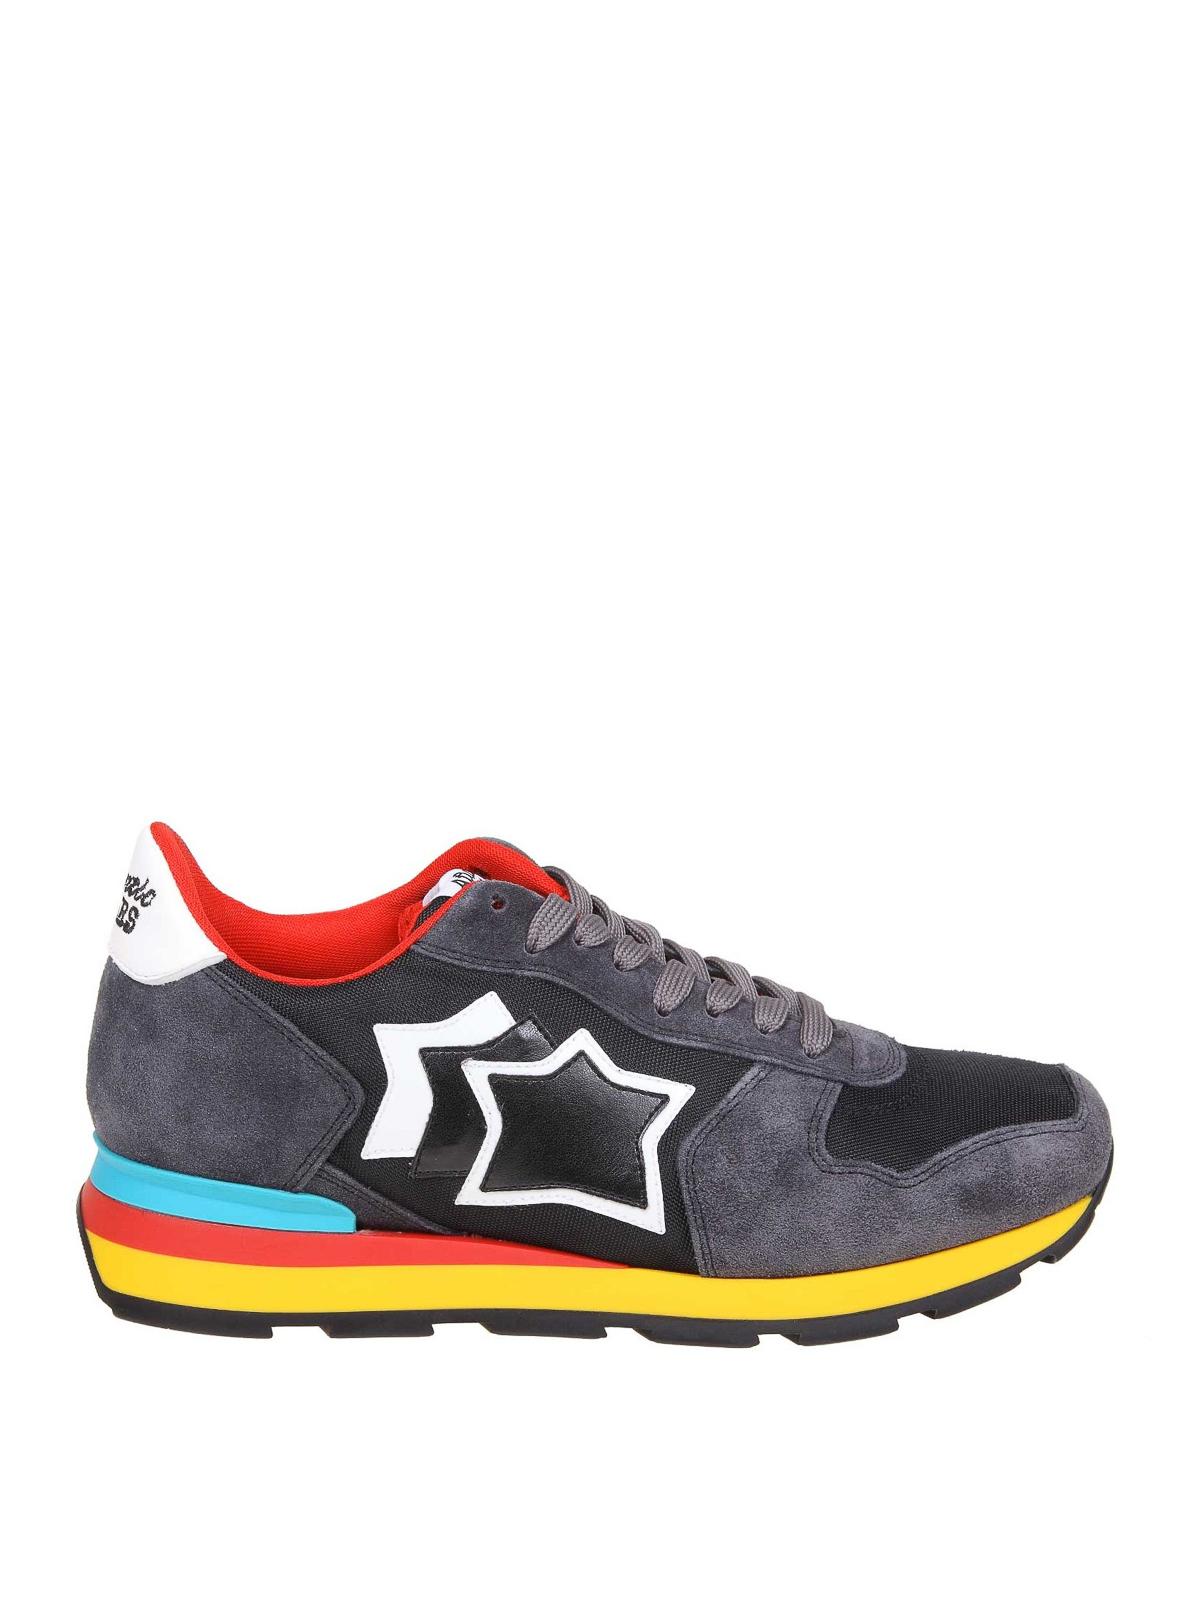 Sneaker Grigio Atlantic Antares Grigie Stars Ikrix Nere Pelle E Ygbf7y6